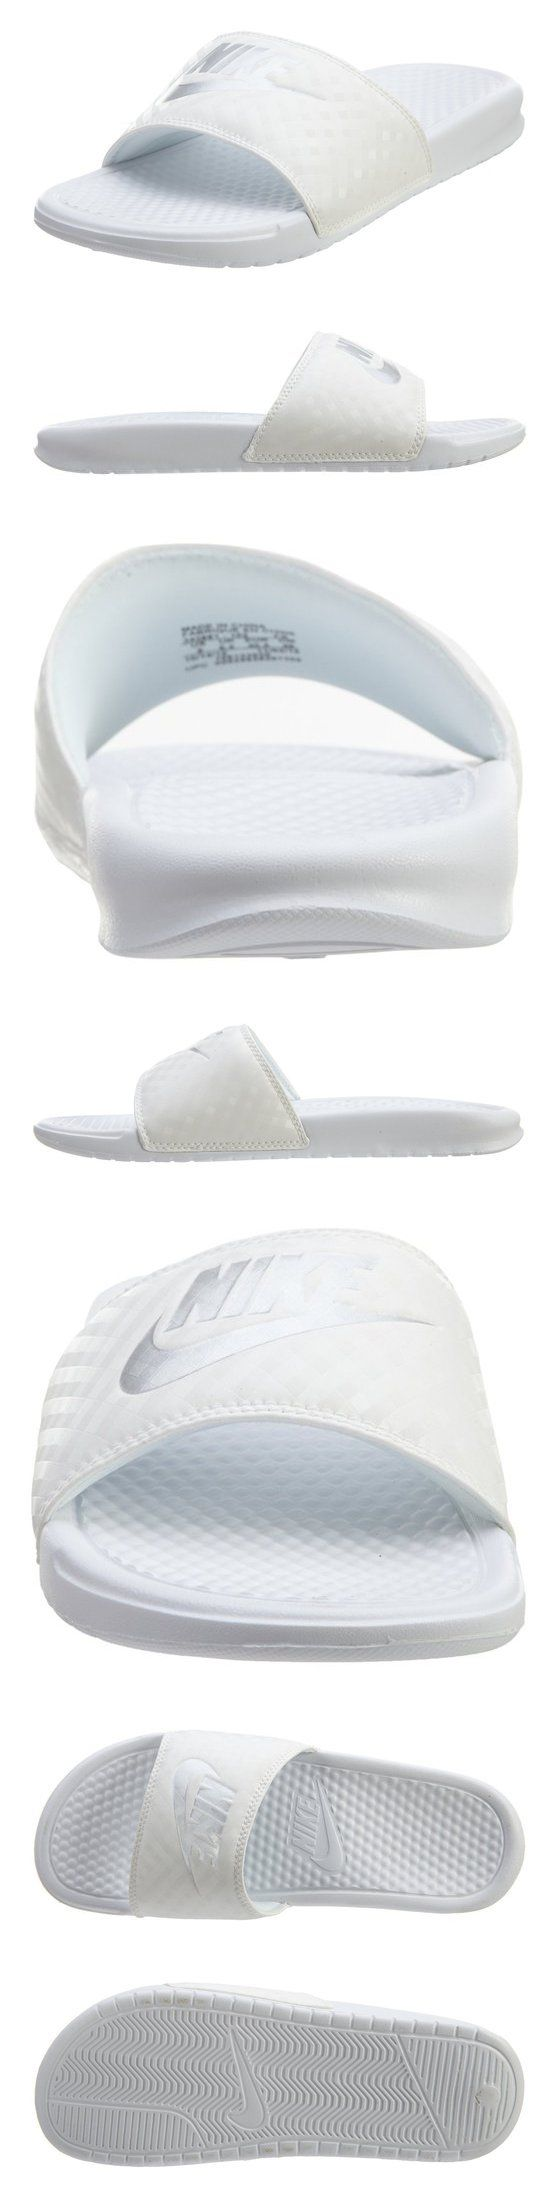 $58 - Nike Benassi JDI Slide Women's Sandals 343881-102 White/Metalic Silver size 9 #shoes #nike #2009